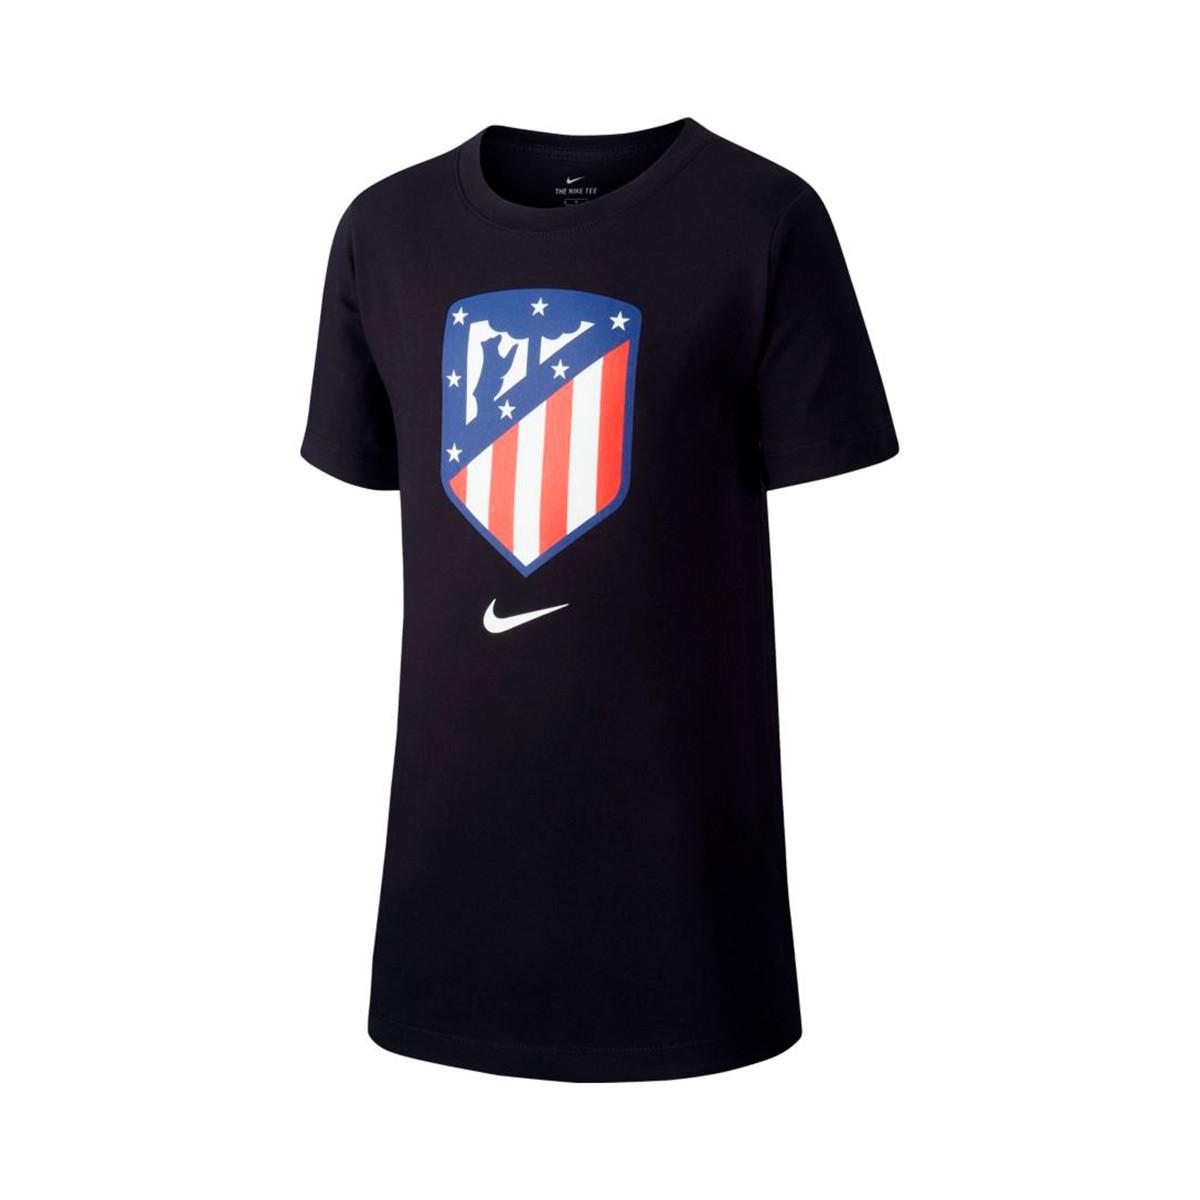 Jersey Nike Atlético Madrid Evergreen 2018-2019 Niño Black ... 3a4bcbdc54a